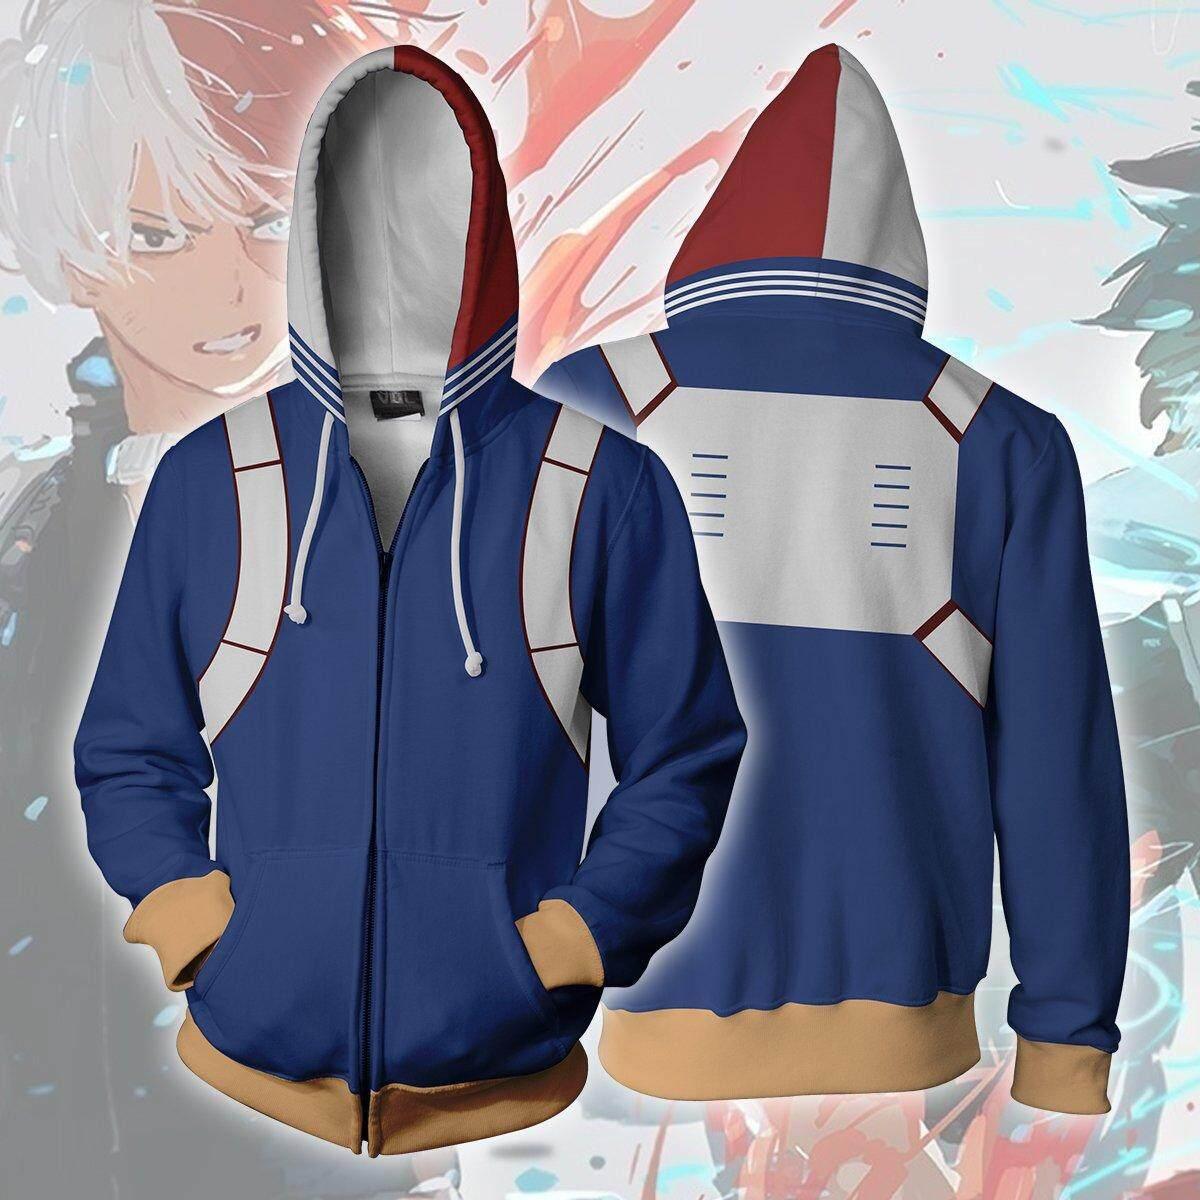 45c6e5bd8 My Hero Academia Shoto Shouto Todoroki Battle Suit Cosplay Costume Hoodie  Sweatshirt Zipper Jacket Coat